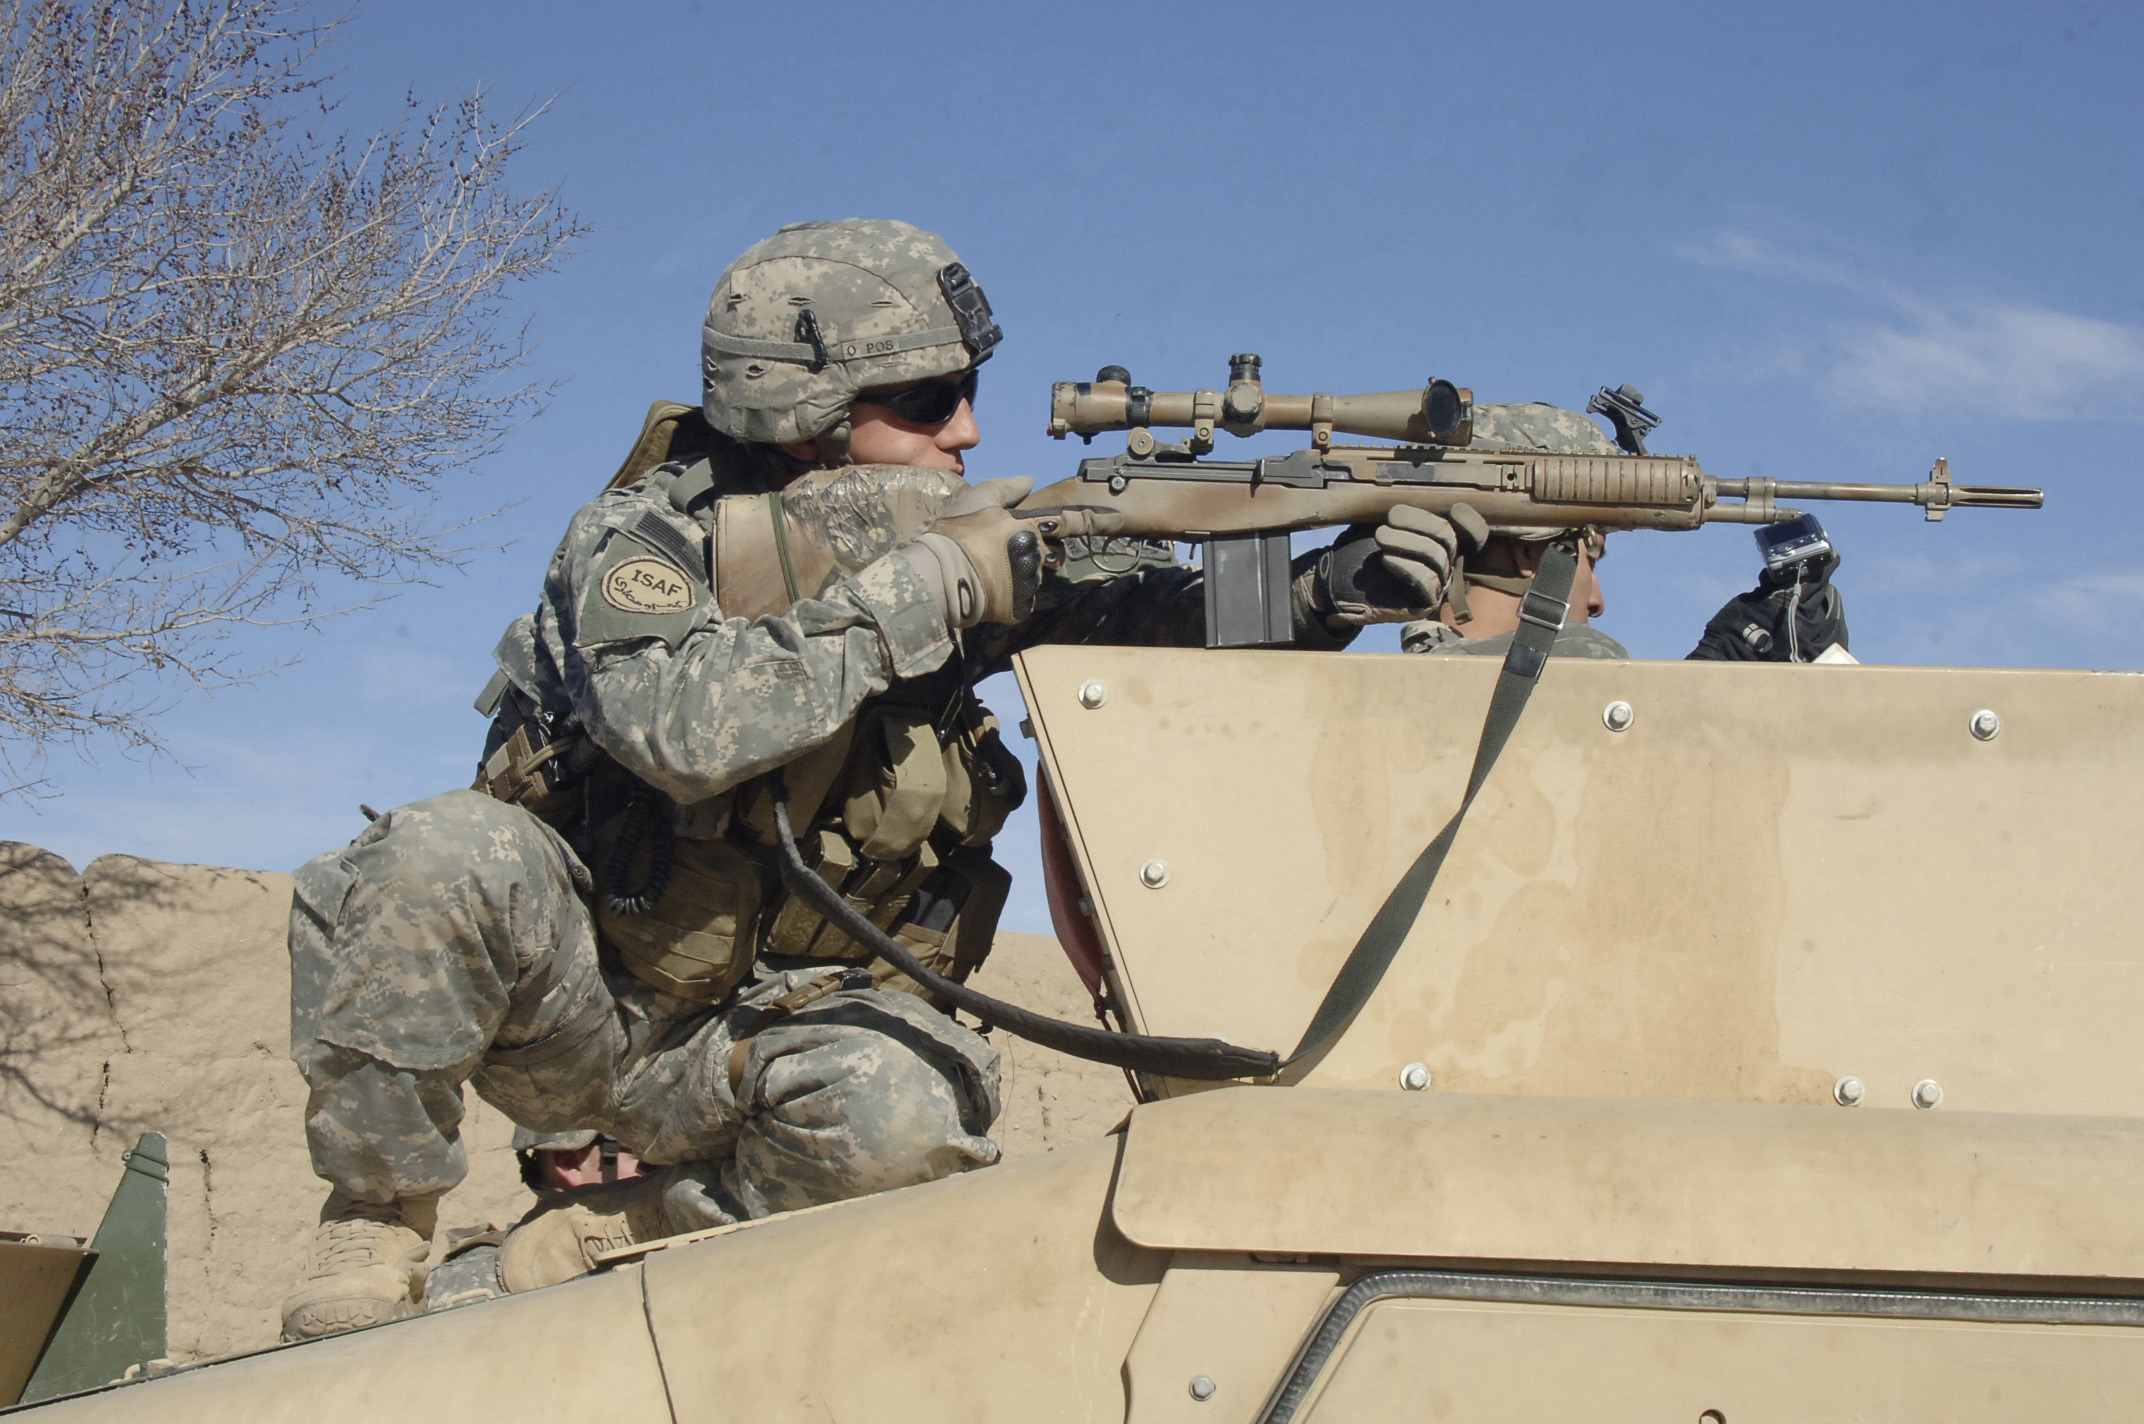 soldiers, military, men, snipers, US Army, Springfield, Humvee, HMMWV -  Free Wallpaper / WallpaperJam.com